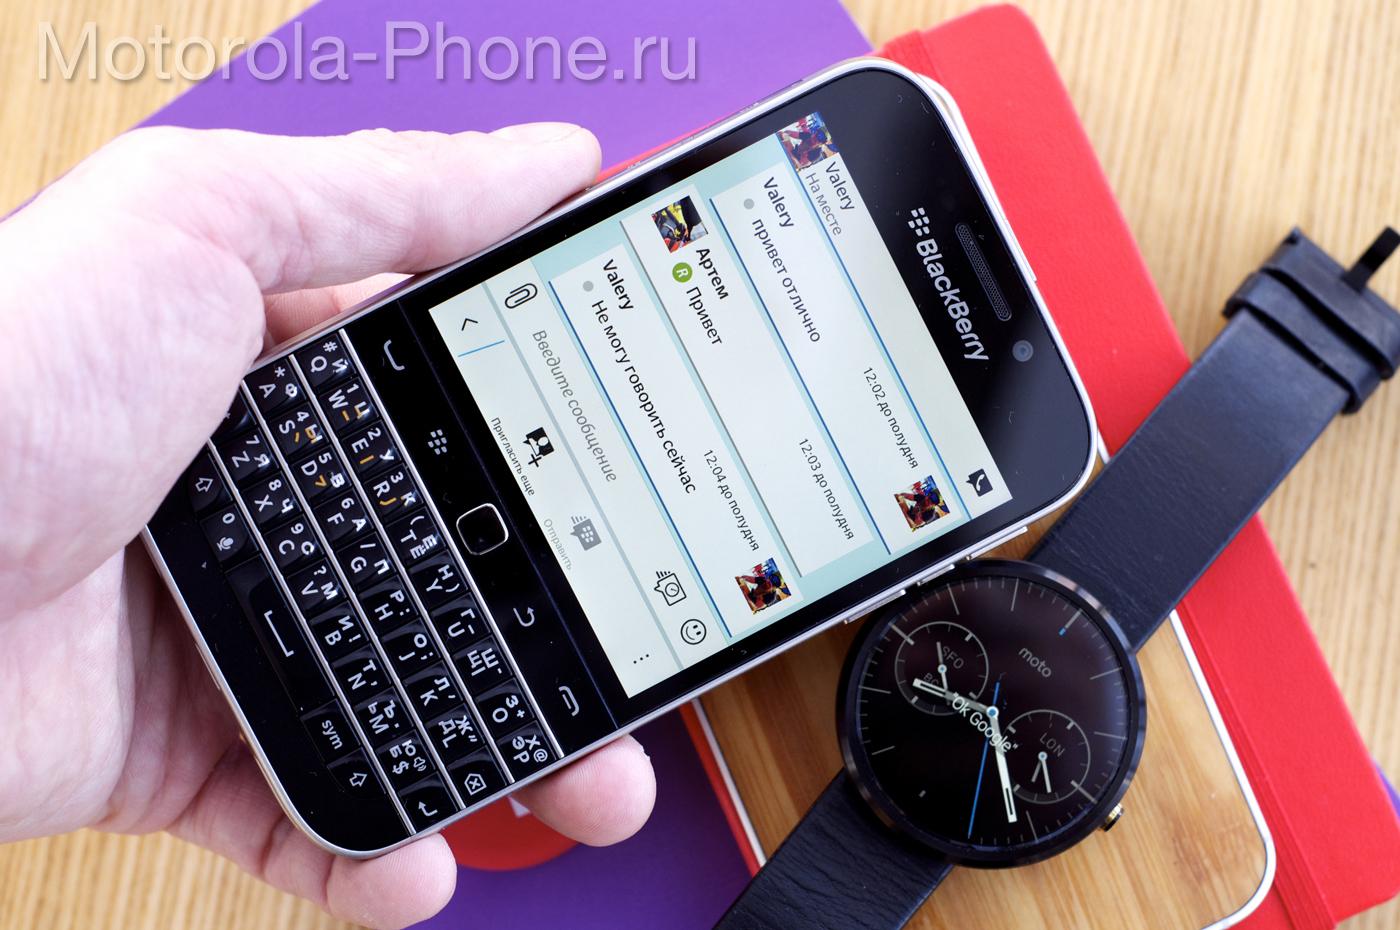 BBM-Android-Wear-Moto-09